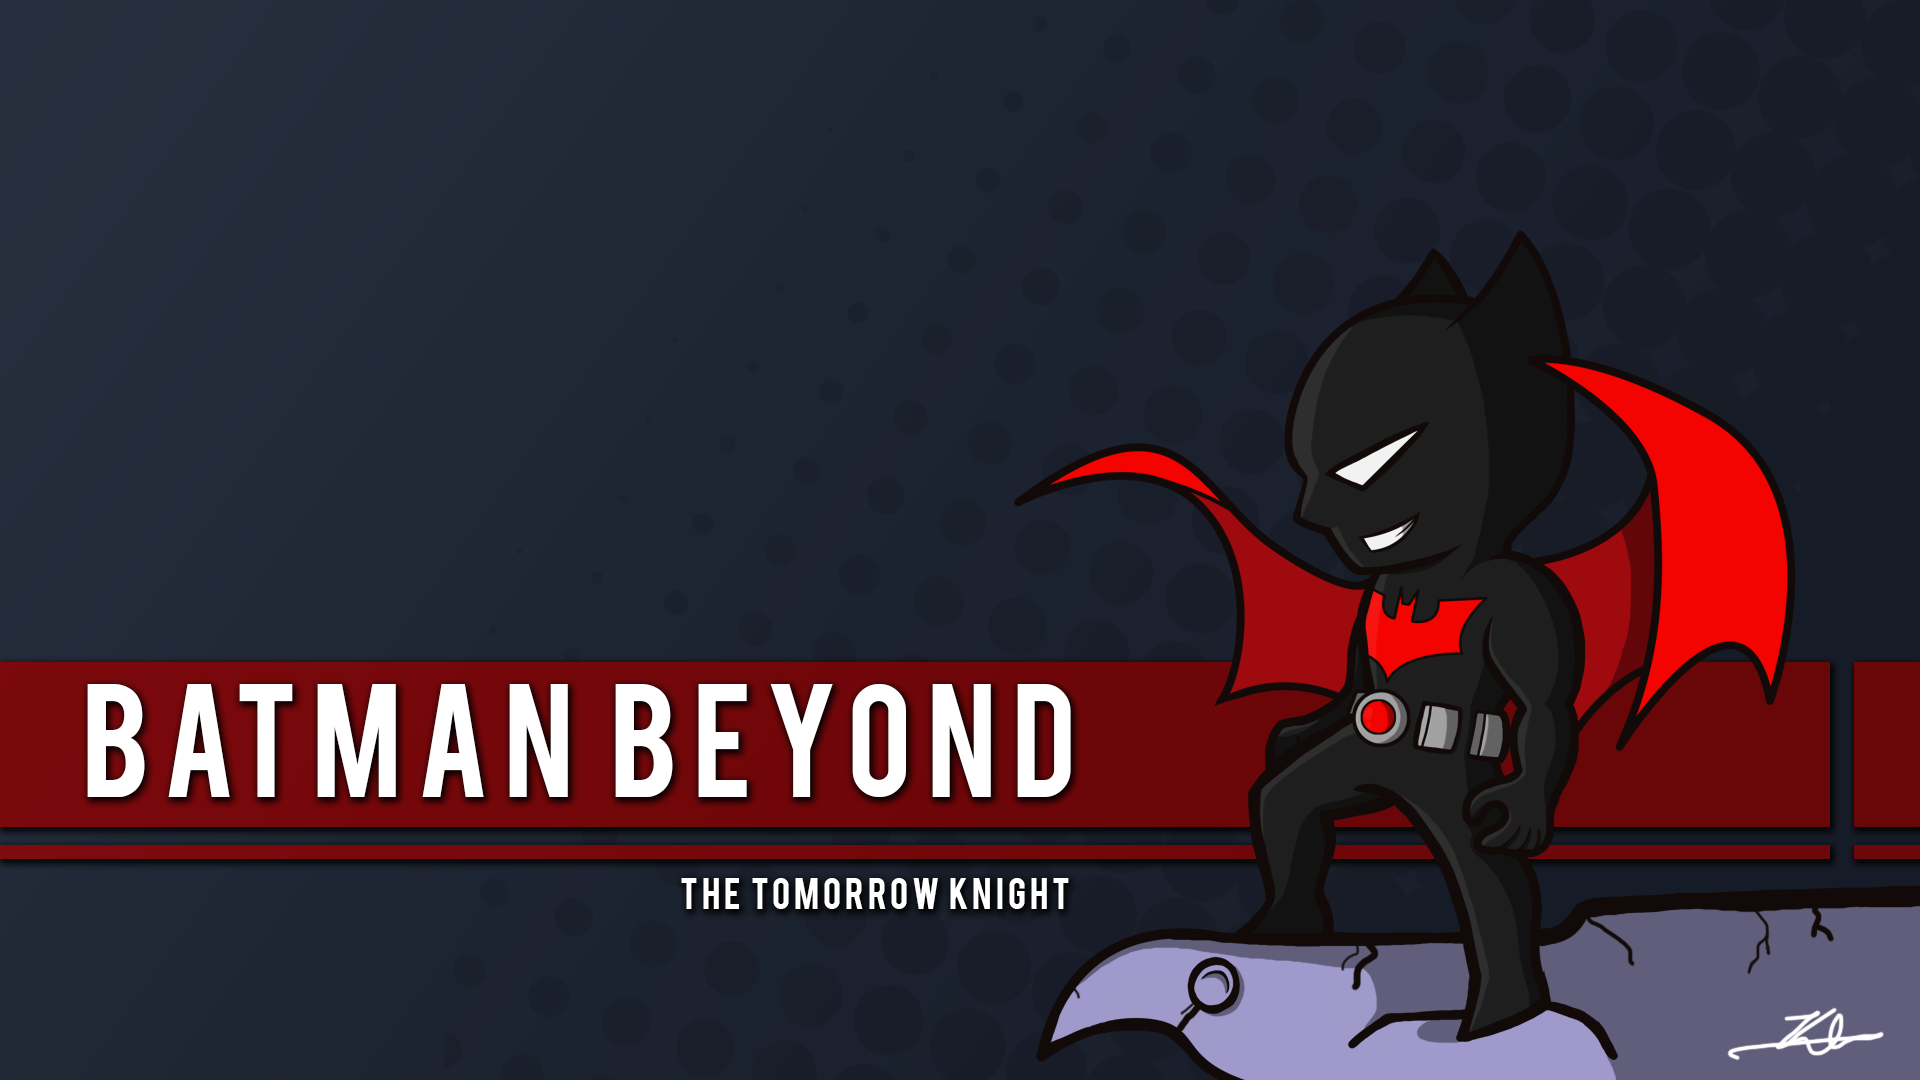 Face the future: download a free batman beyond mask | dc.